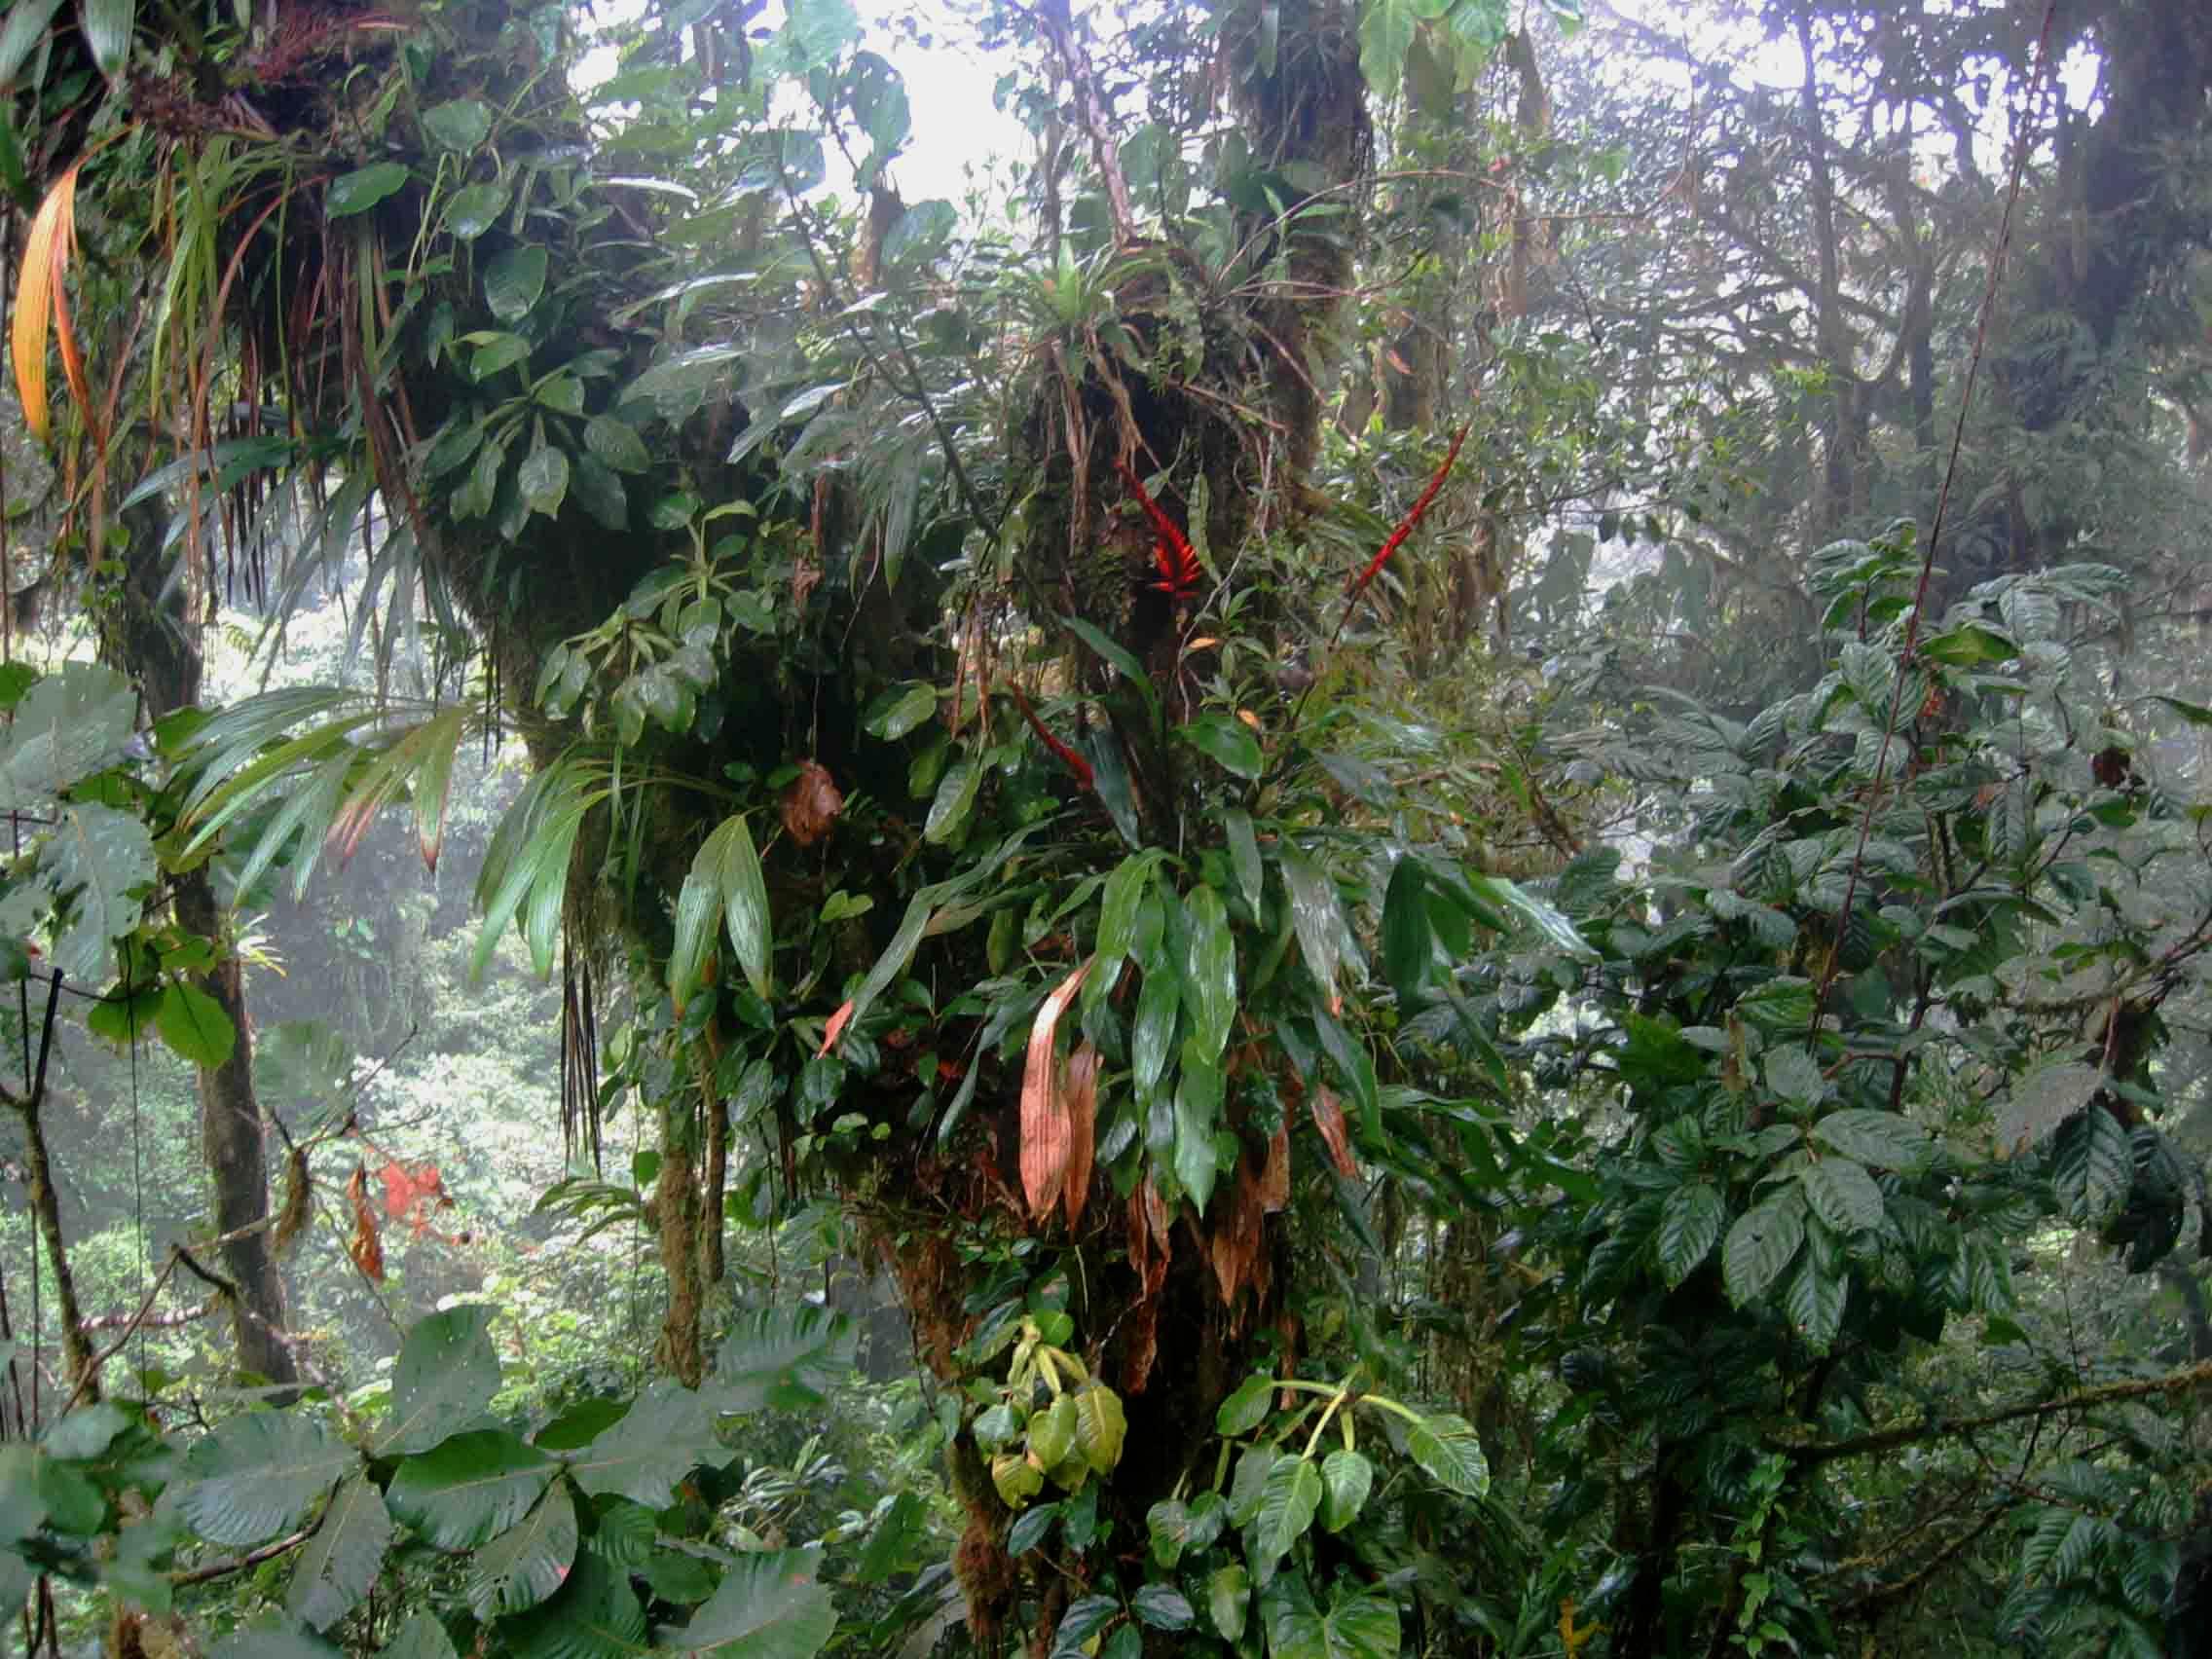 Primärer Regenwald in Costa Rica